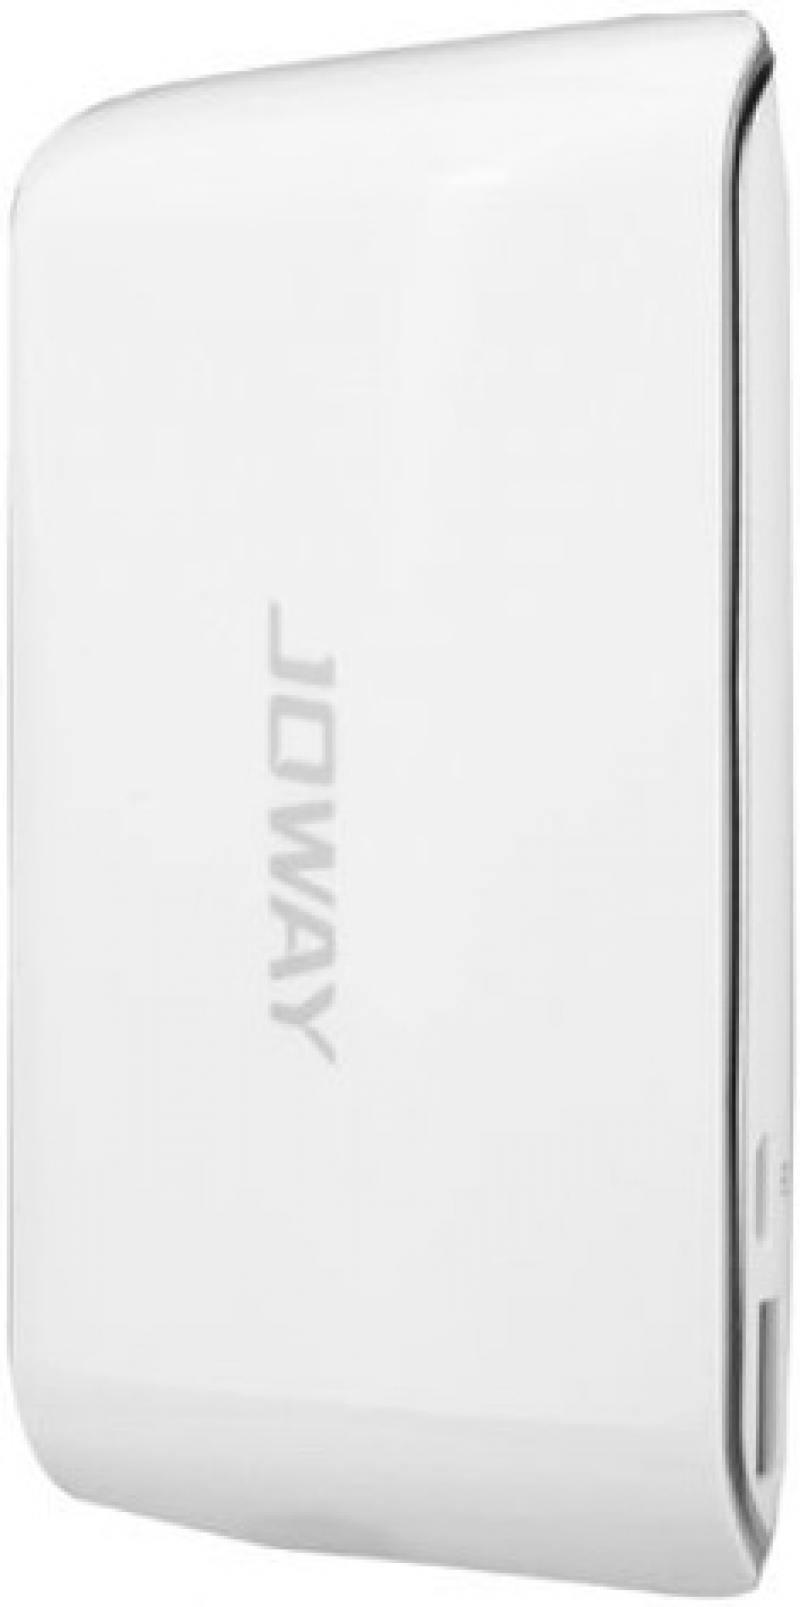 Внешний аккумулятор Joway JP29 6000 mAh белый аккумулятор gopro portable power pack 6000 mah azpbc 001